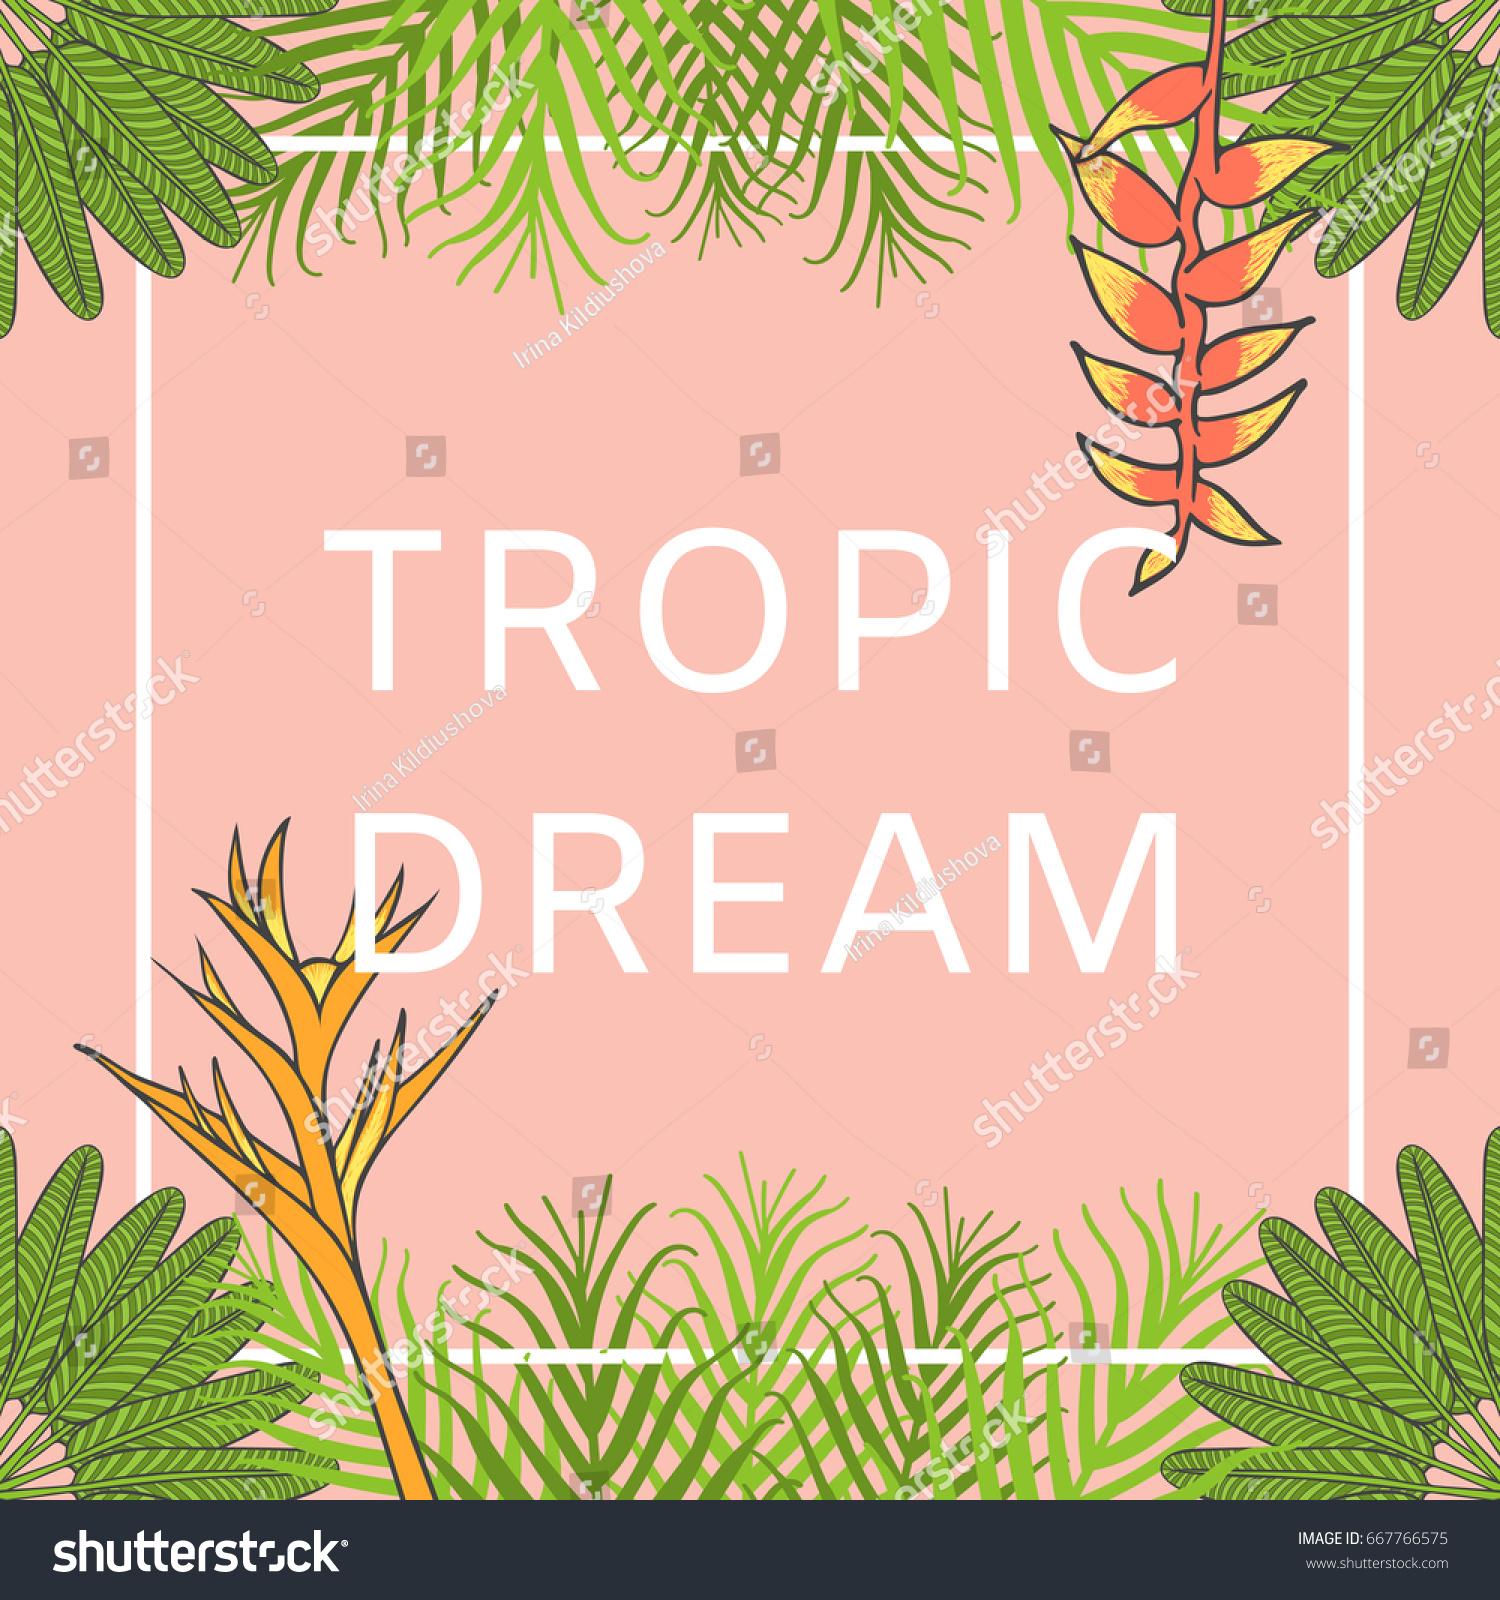 flower hawaiian background vector floral summer stock vector 667766575 shutterstock. Black Bedroom Furniture Sets. Home Design Ideas